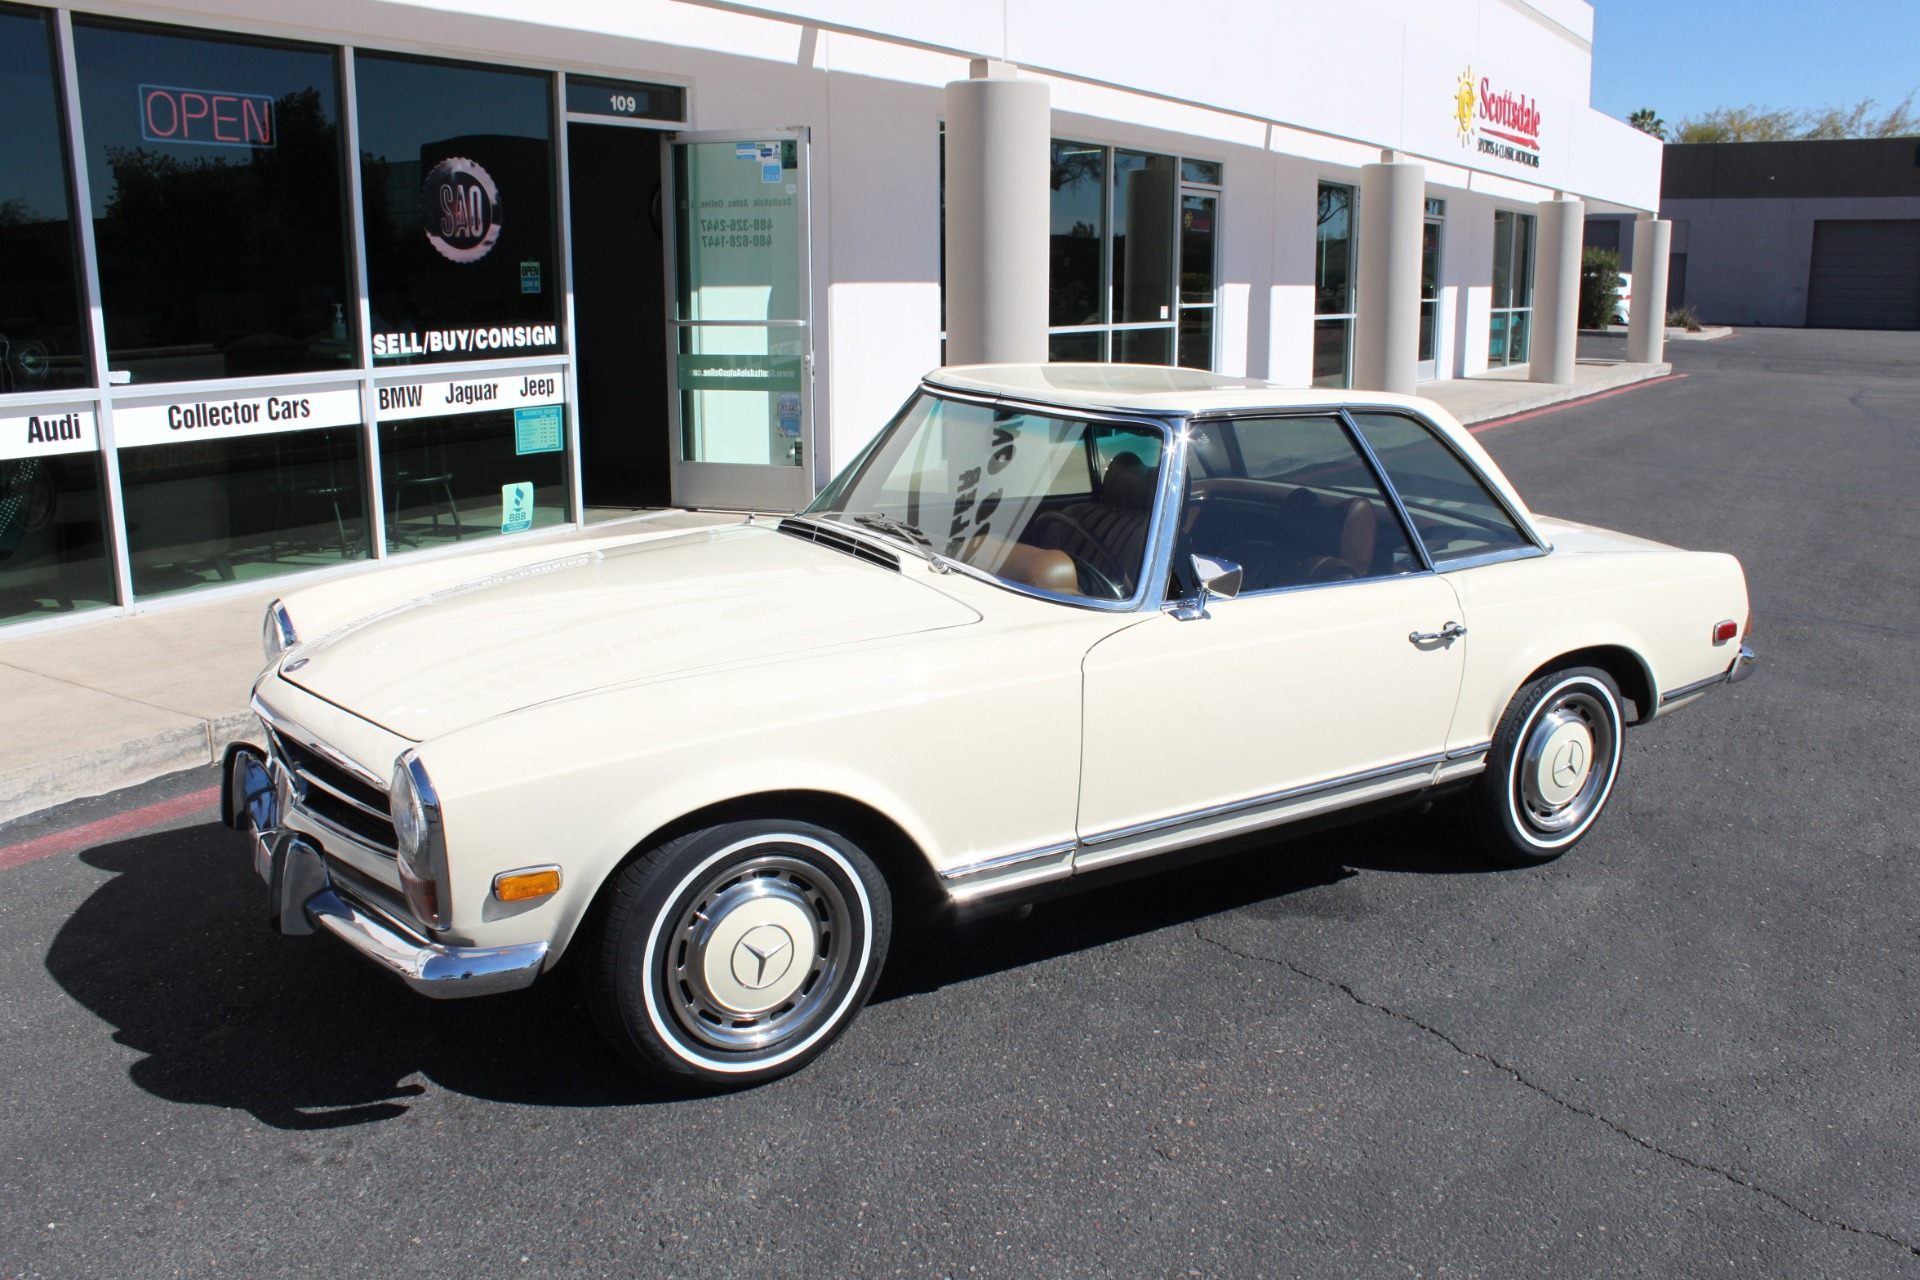 Used-1971-Mercedes-Benz-280SL-Convertible-Land-Cruiser